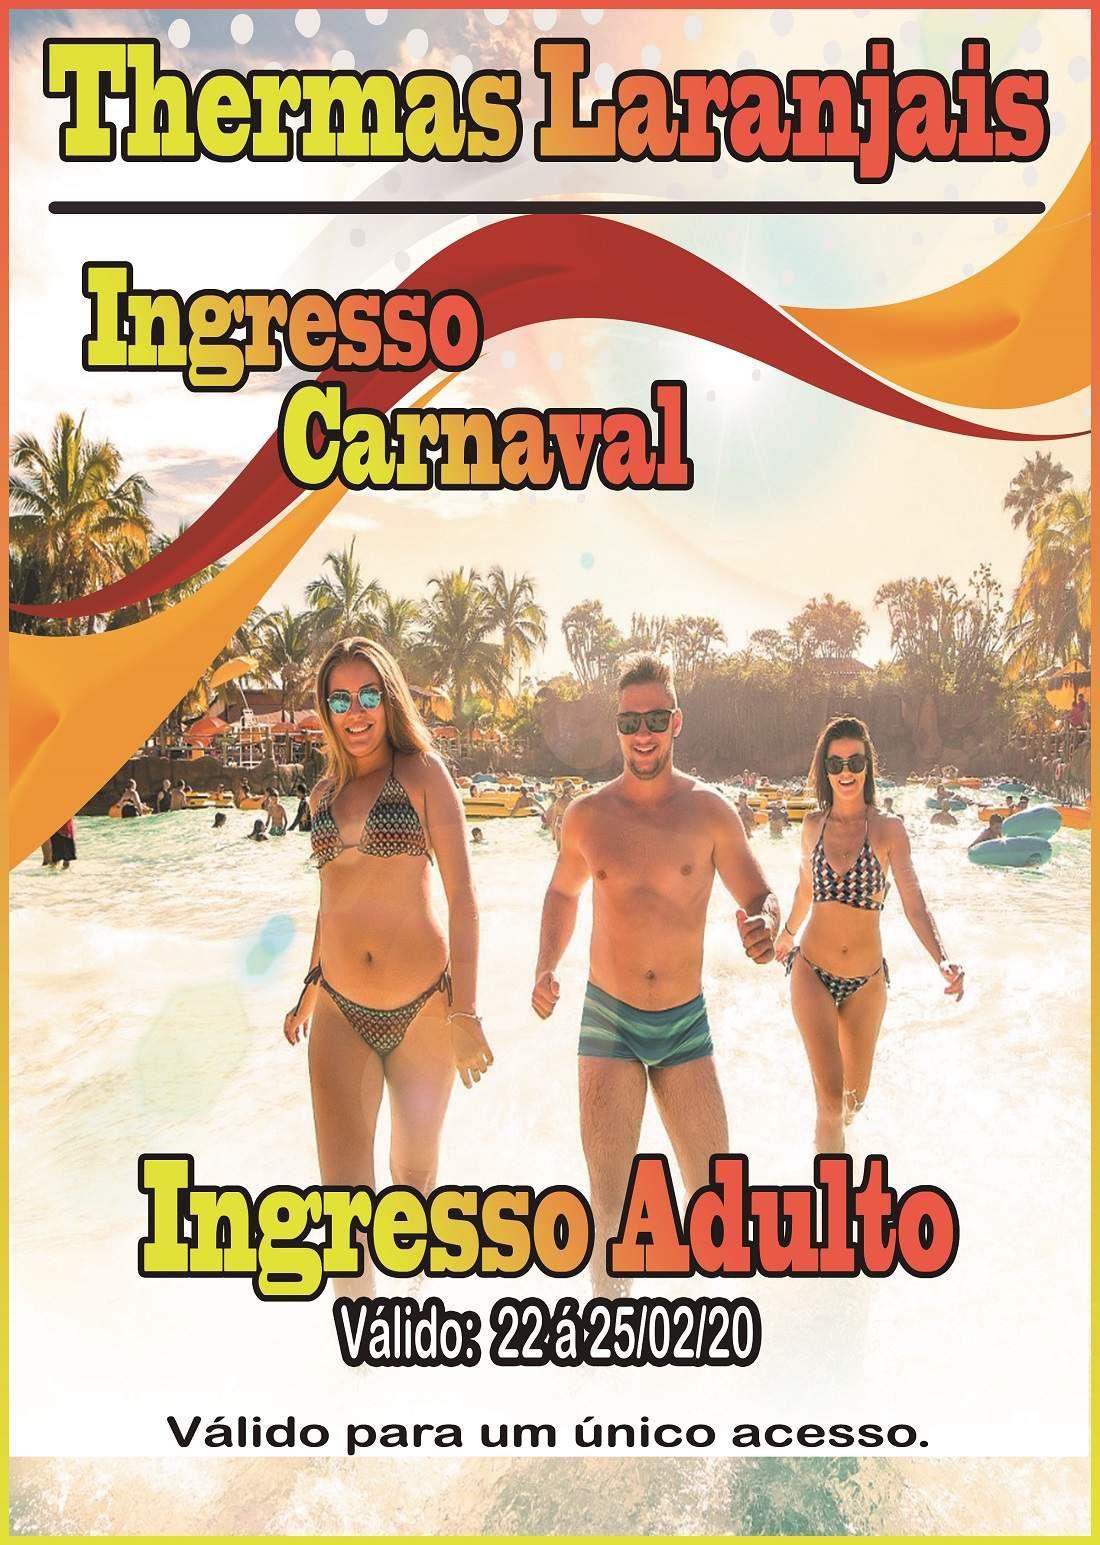 Ingresso Adulto - Carnaval 2020  - Thermas Fácil